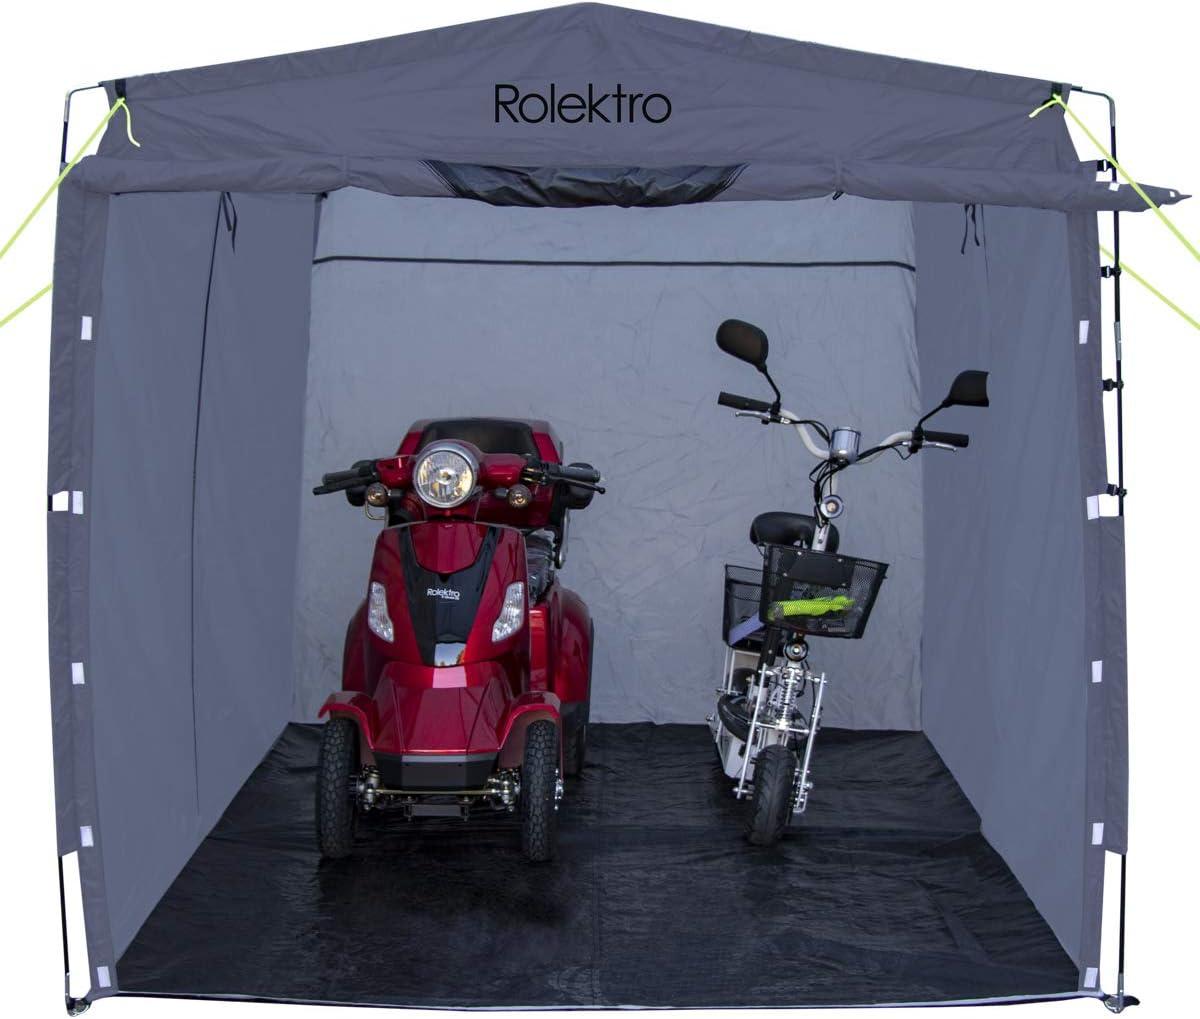 E-Roller Scooter E-Bike Garagenzelt Ger/ätezelt Rolektro XXL Fahrrad Garage 290x200x195cm Fahrrad-Zelt